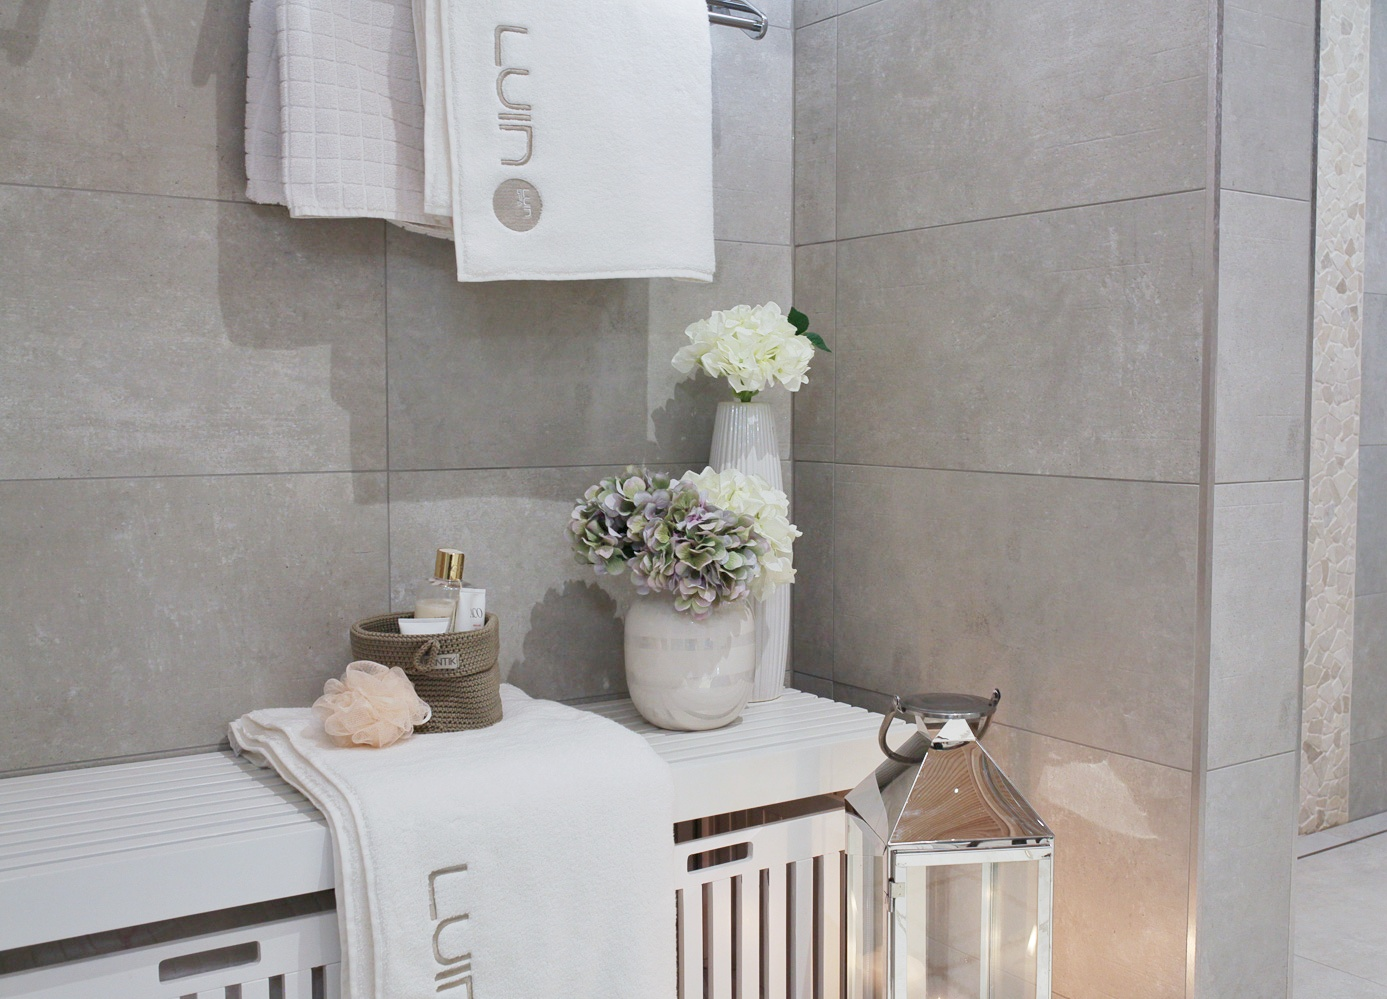 luinspa kylpyhuone-15-01